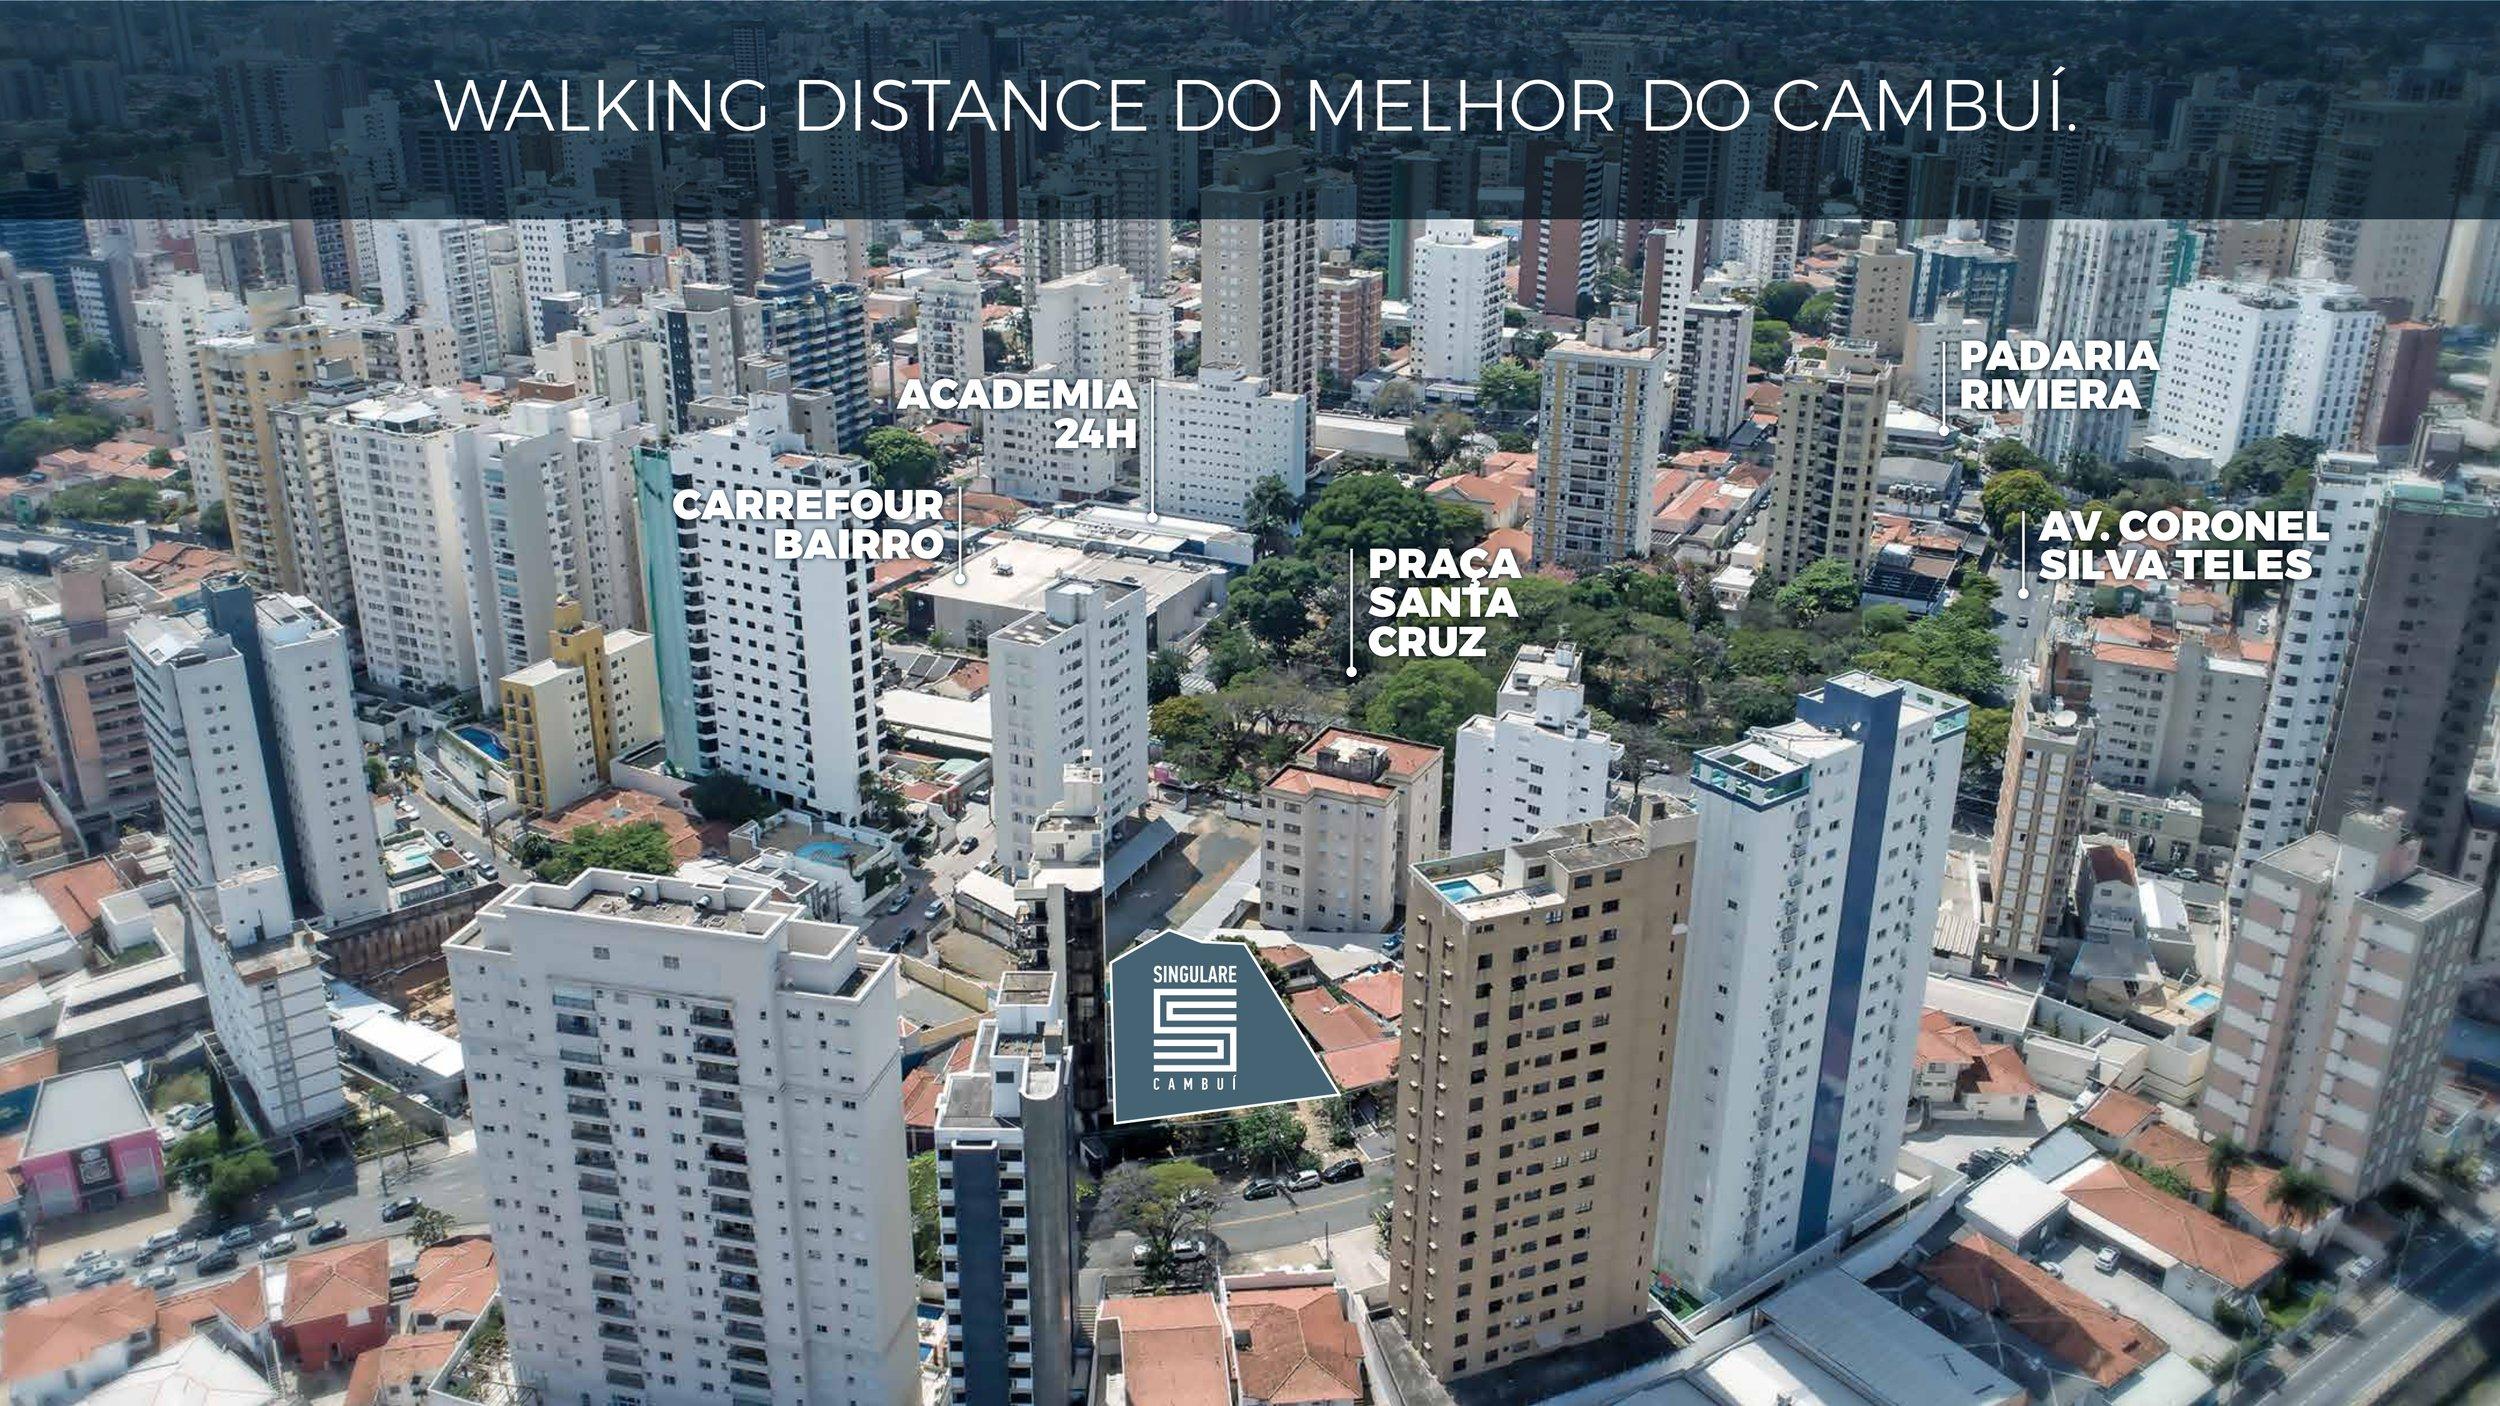 local walking distance.jpg